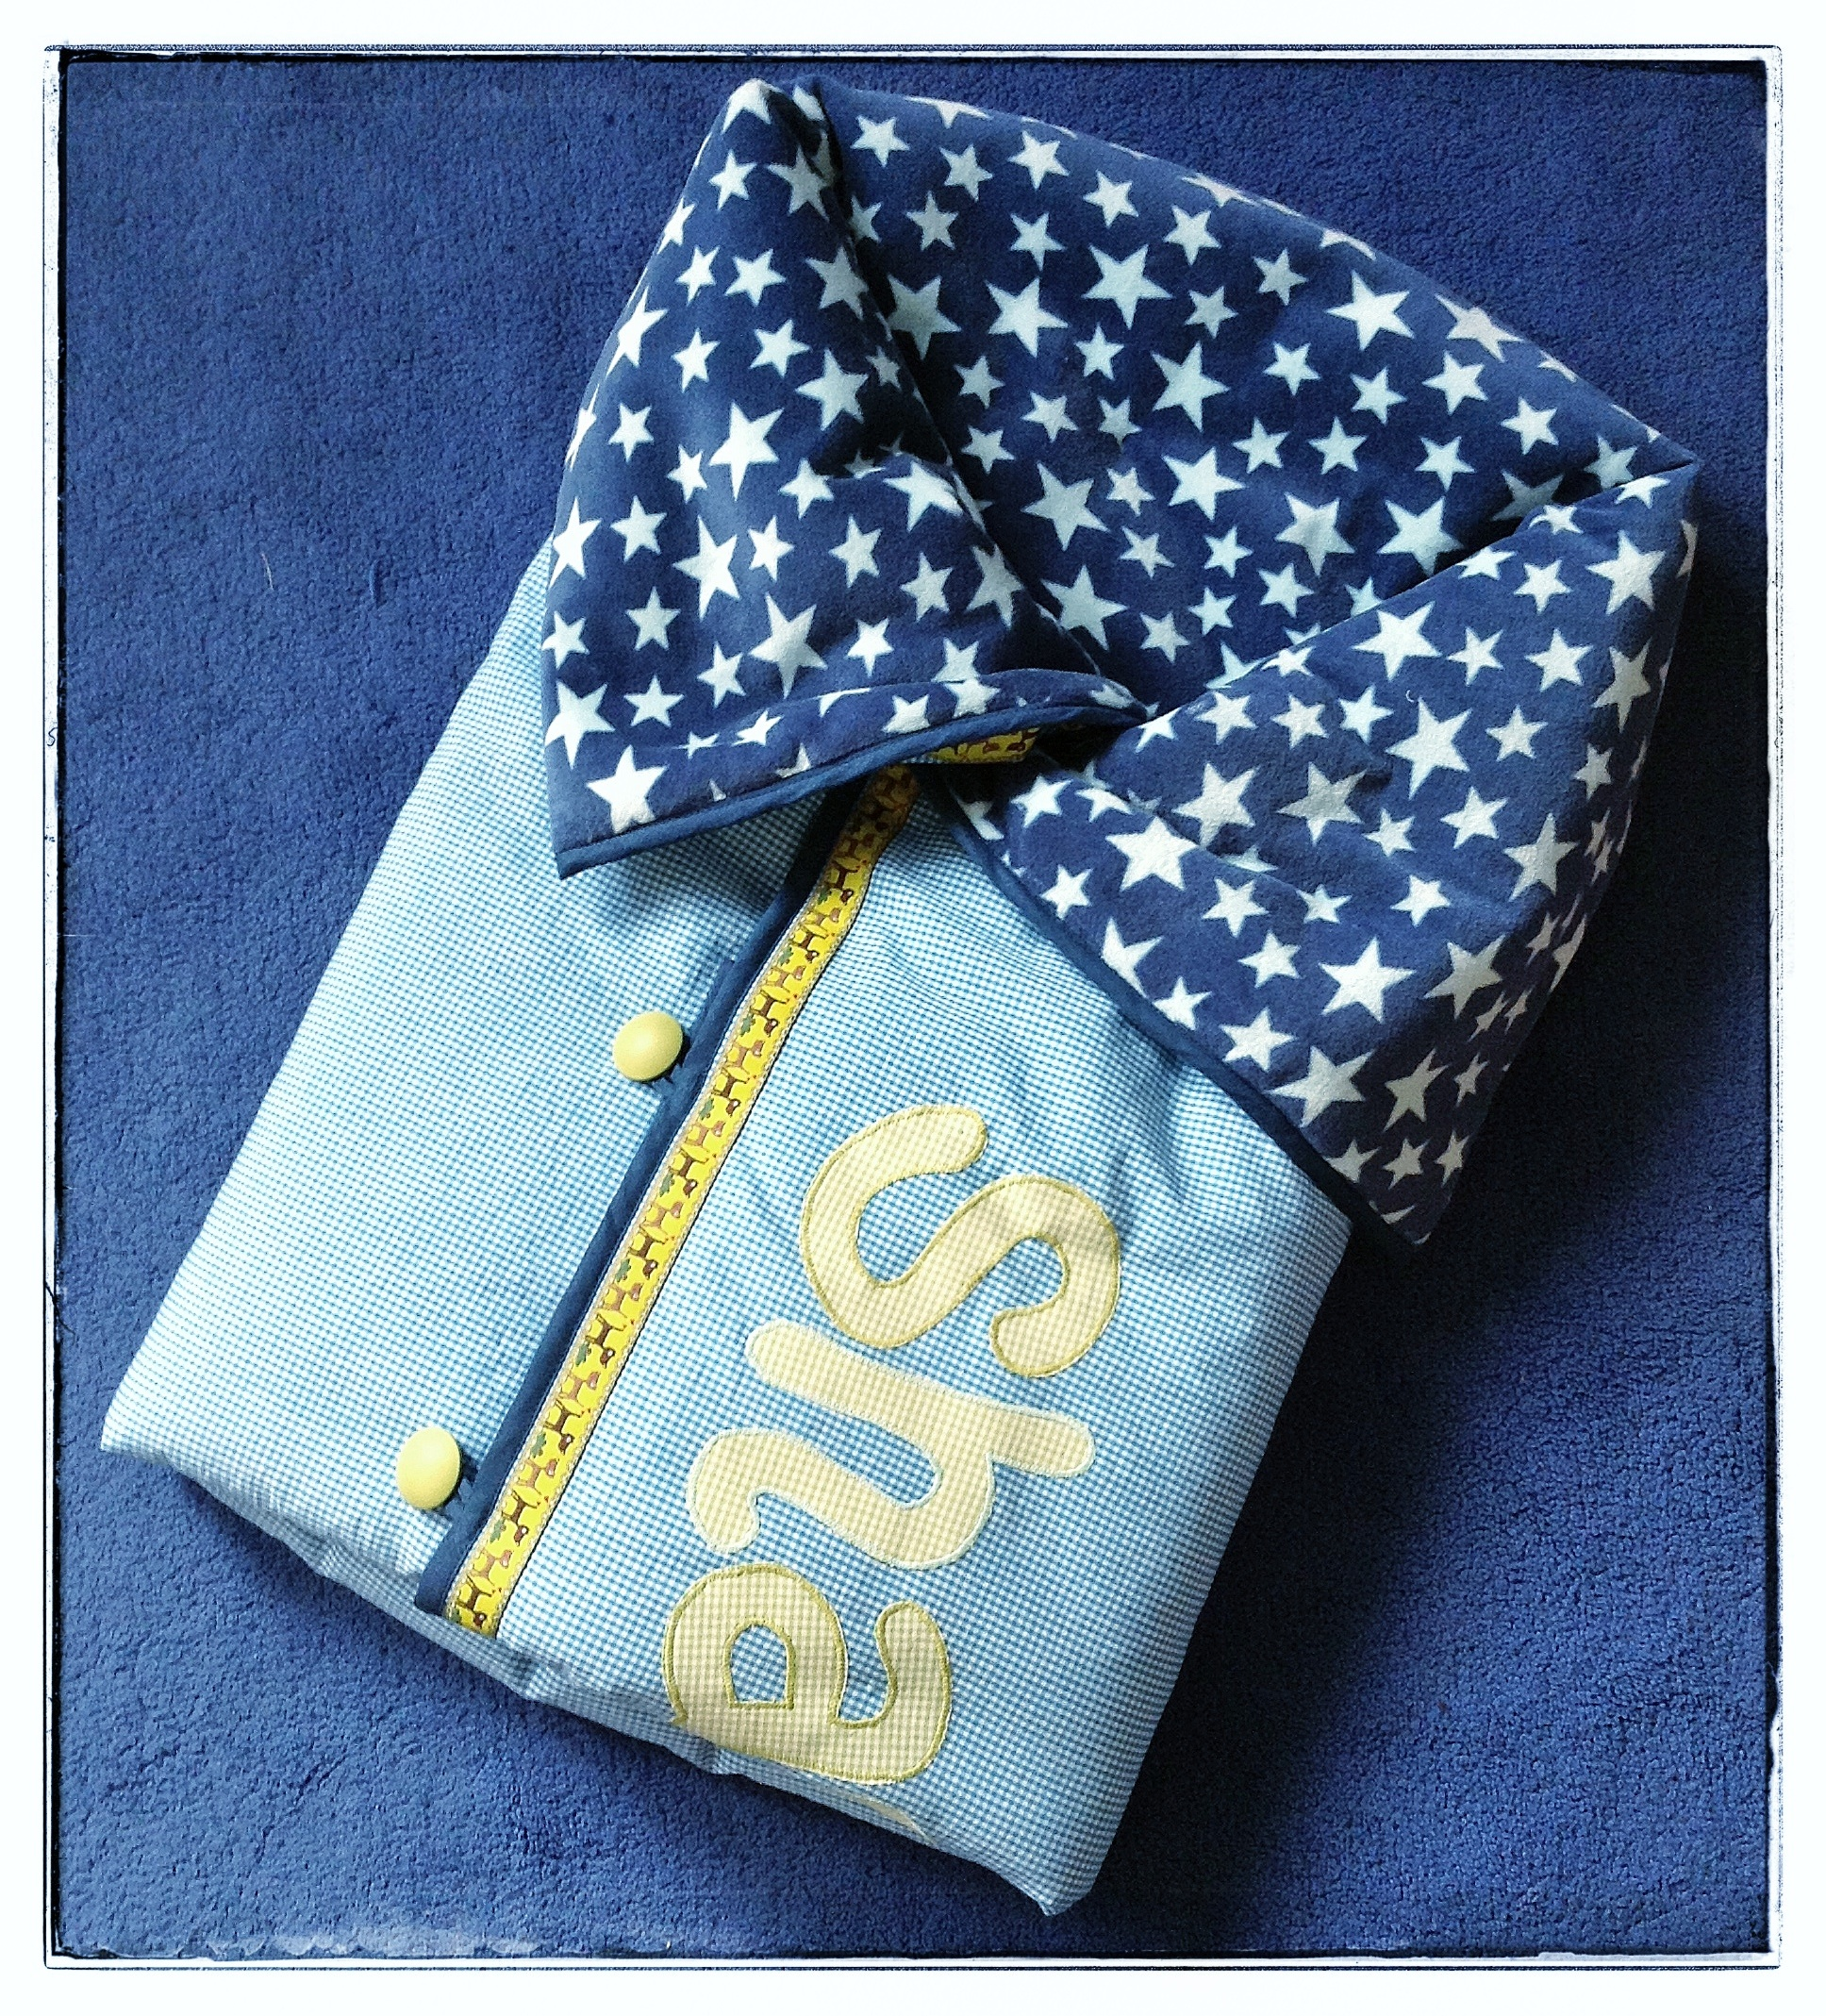 Baby Sleeping Bag Sewing Projects Burdastyle Com